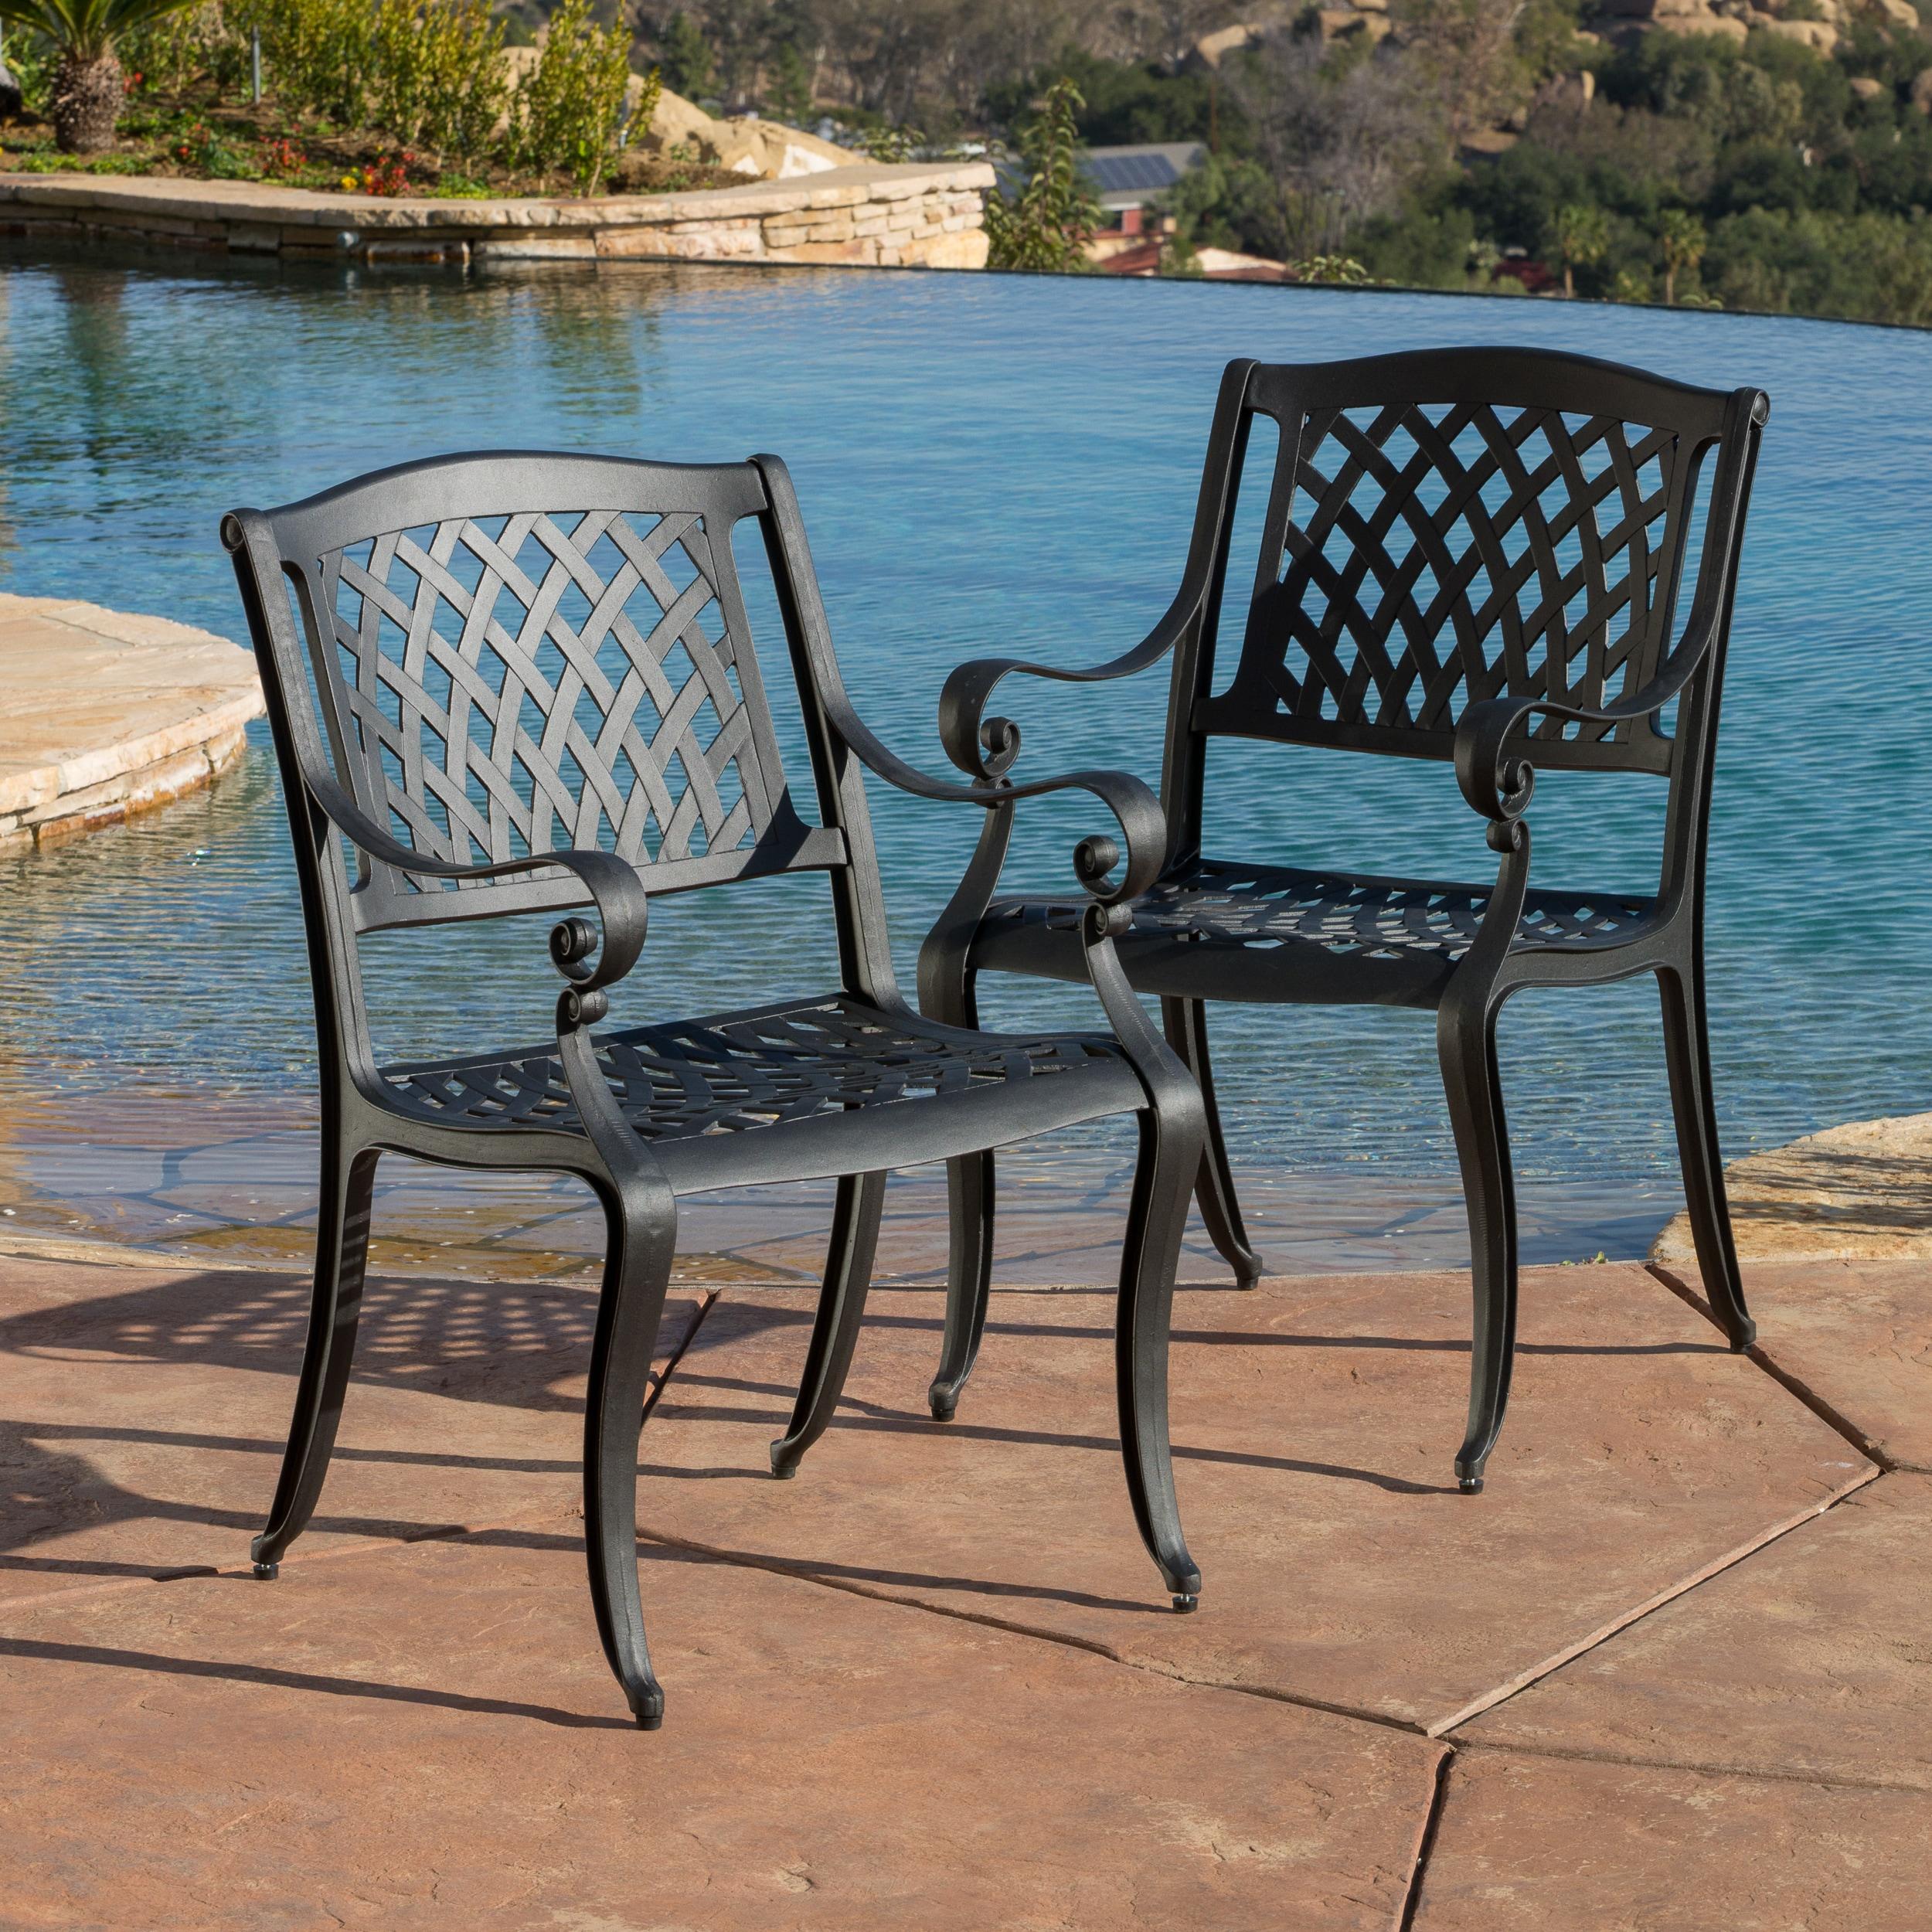 Incredible Outdoor Cayman Cast Aluminum Outdoor Chair Set Of 2 By Christopher Knight Home Inzonedesignstudio Interior Chair Design Inzonedesignstudiocom